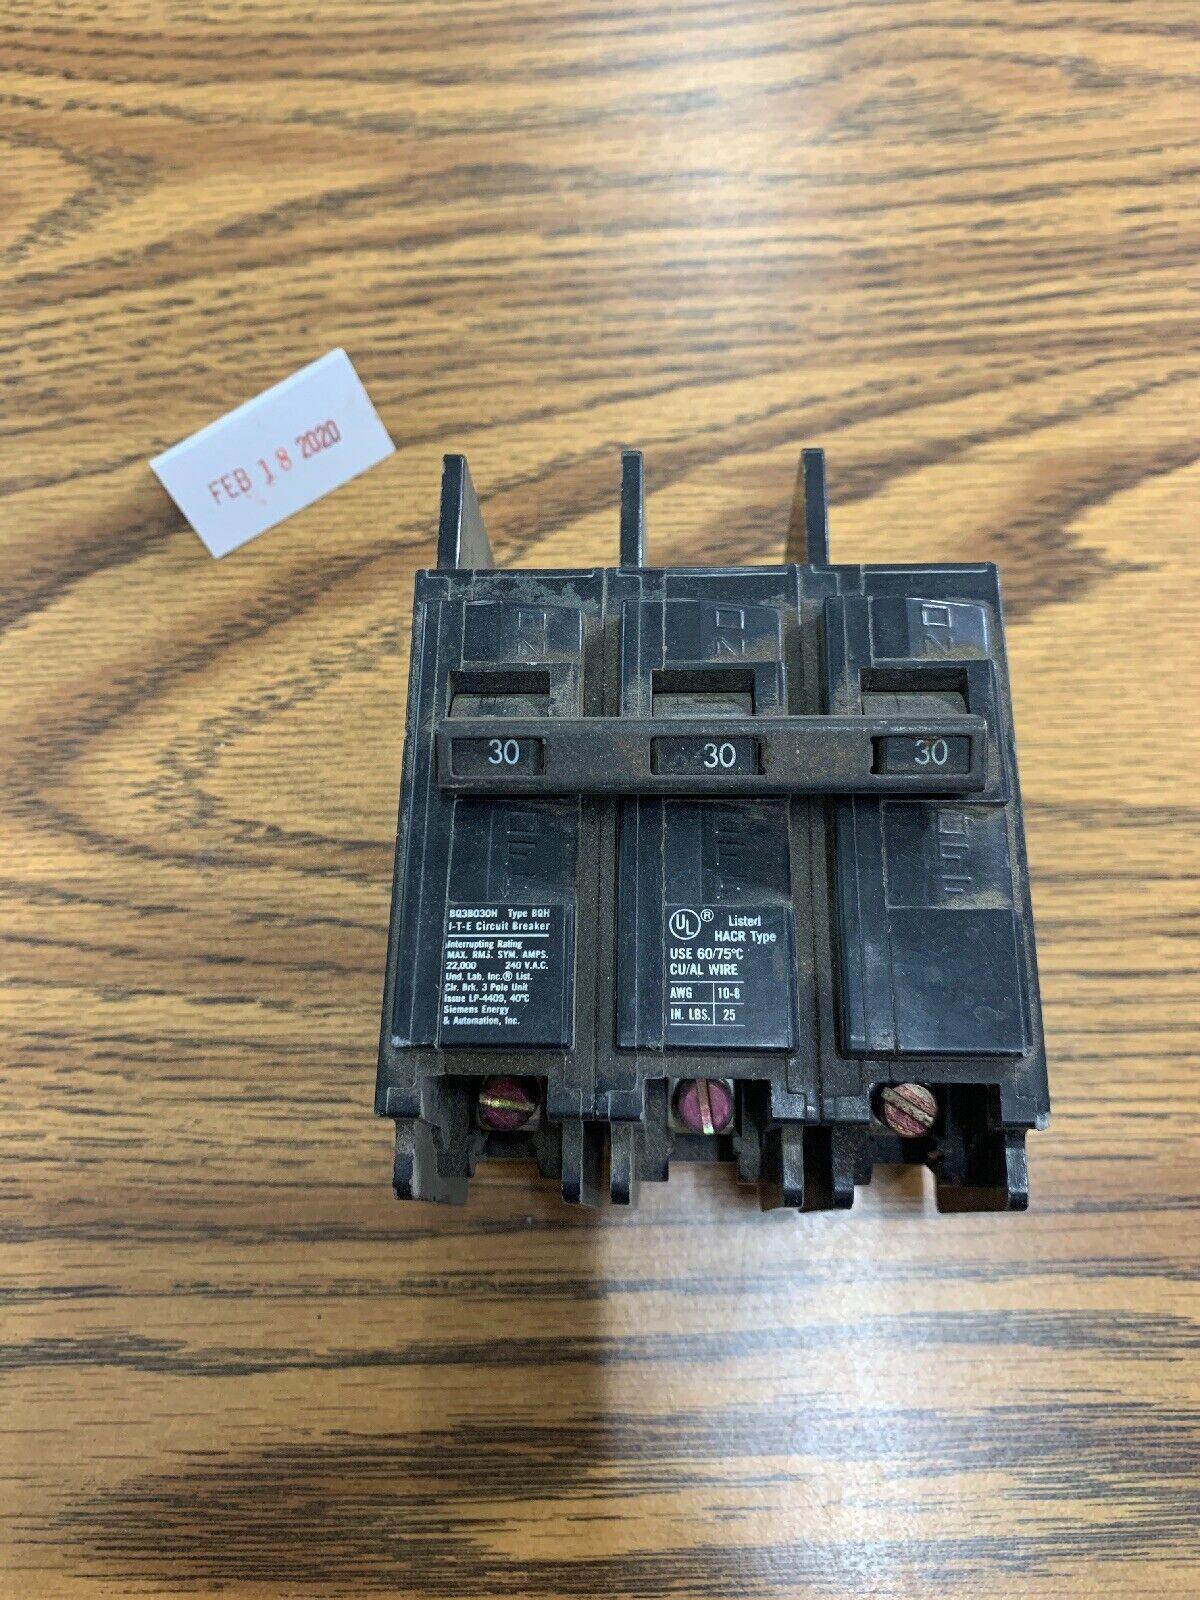 BOX#133 NEW  MODULE   1DI400A-060  OVERNIGHT SAME DAY SHIPPING